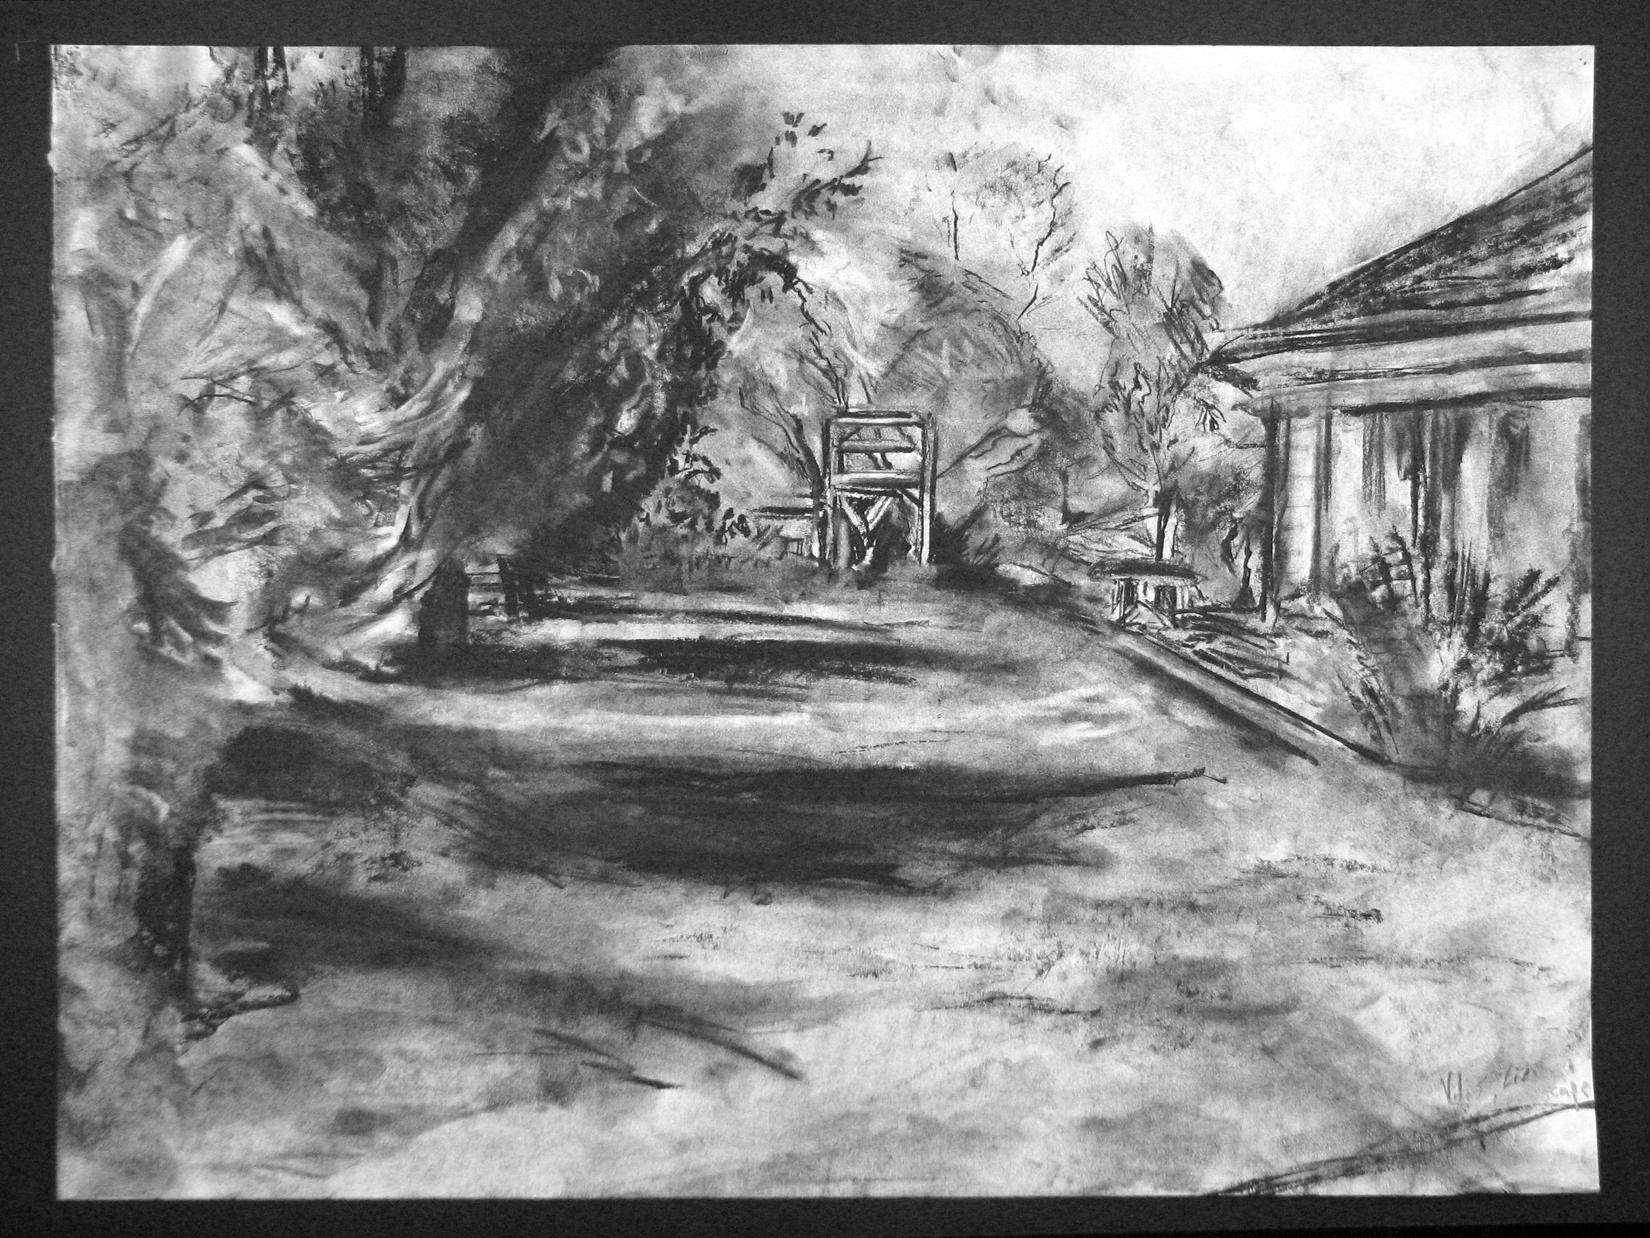 landscape charcoal sketches - photo #4